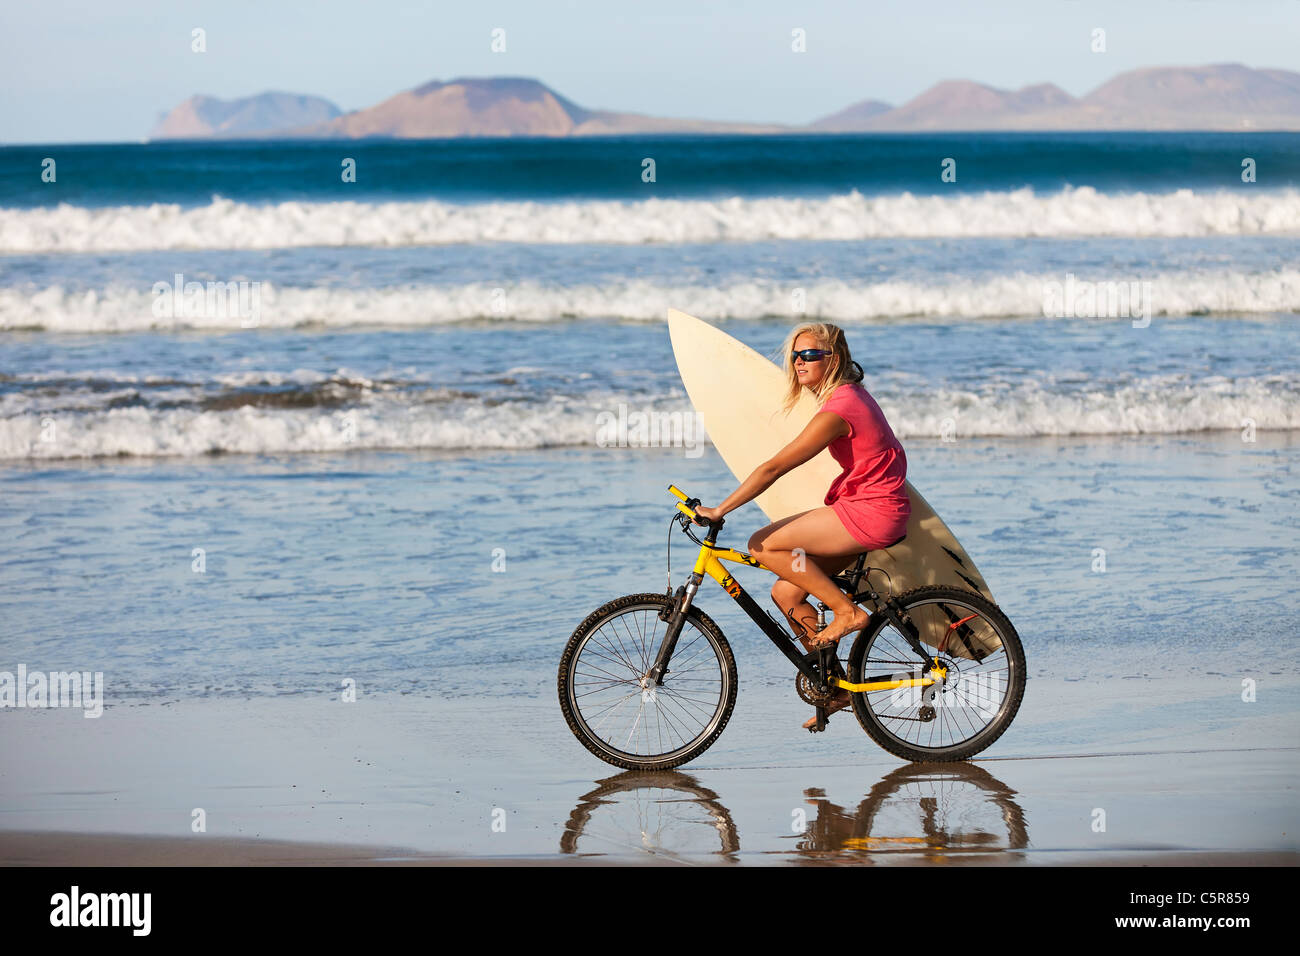 Surfer reiten Mountainbike entlang der Ozeane. Stockbild